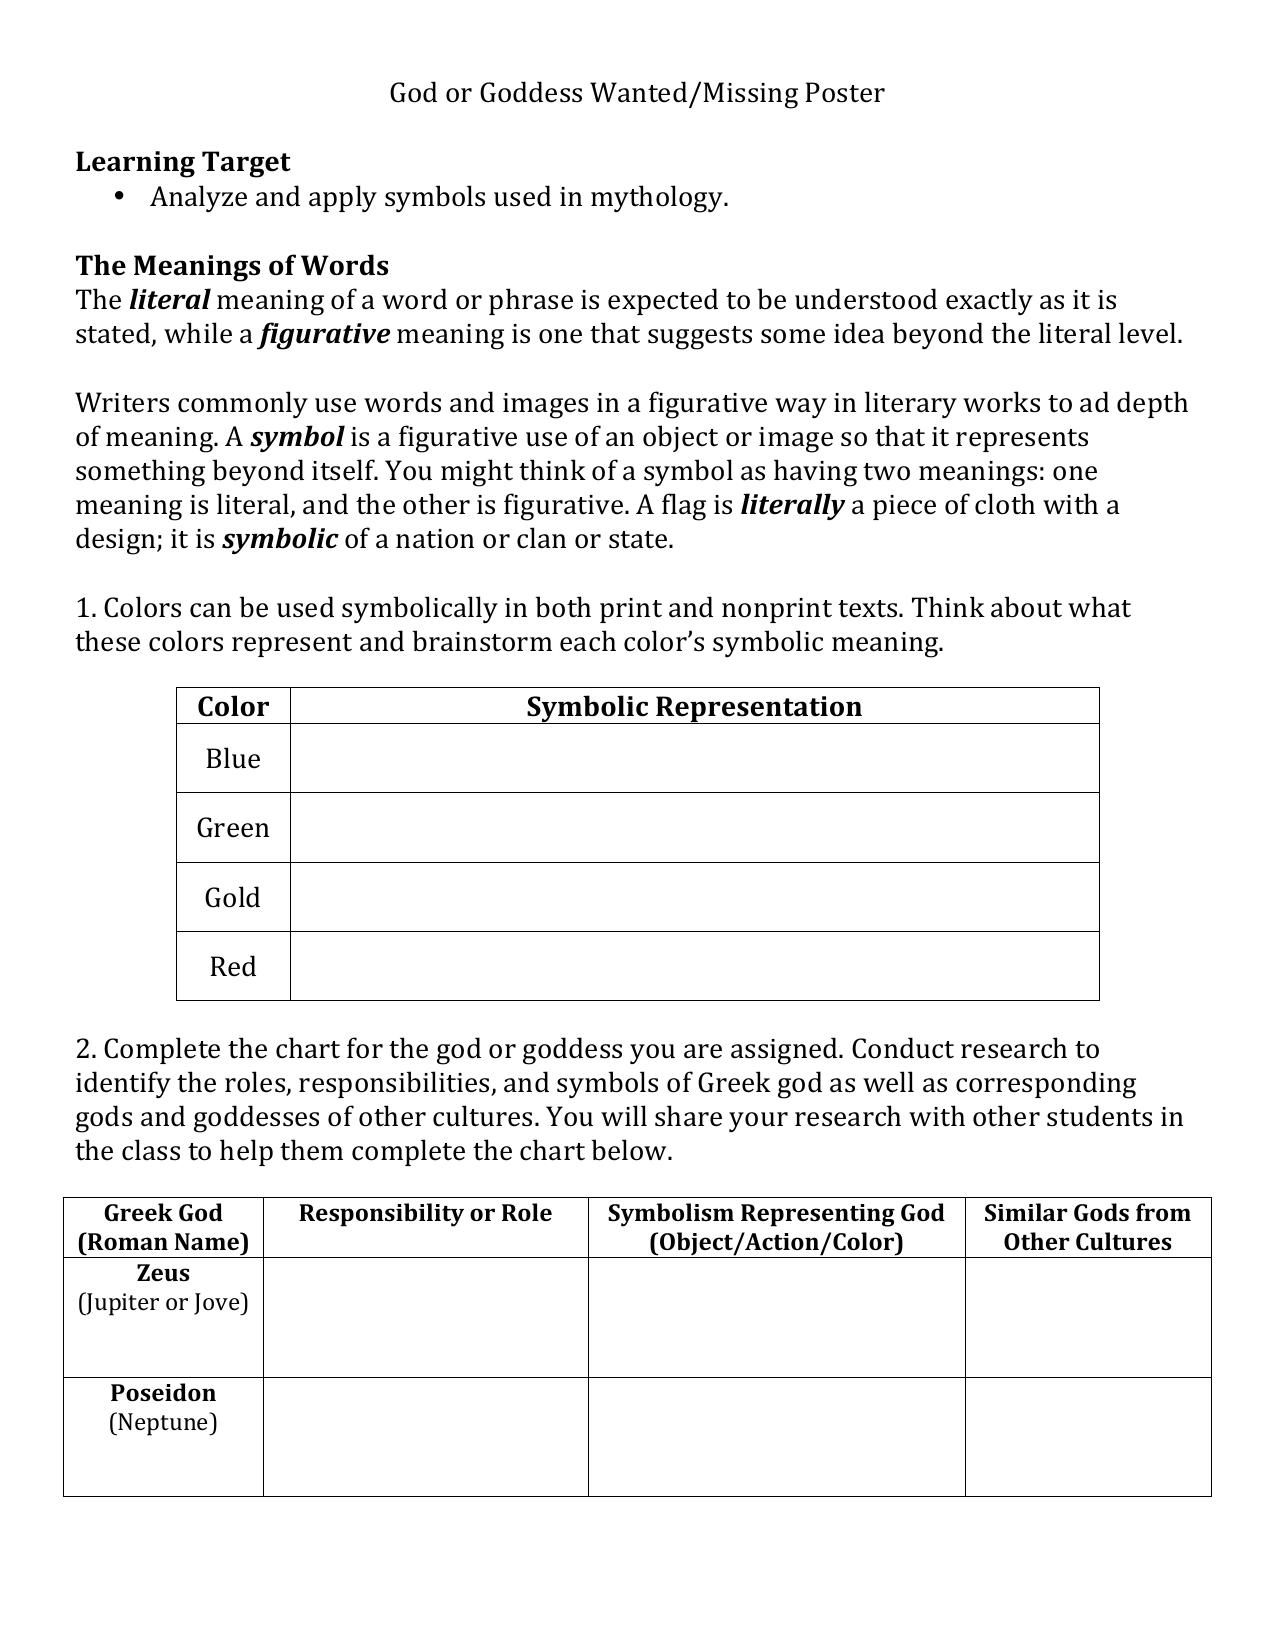 God Or Goddess Wantedmissing Poster Learning Target Analyze